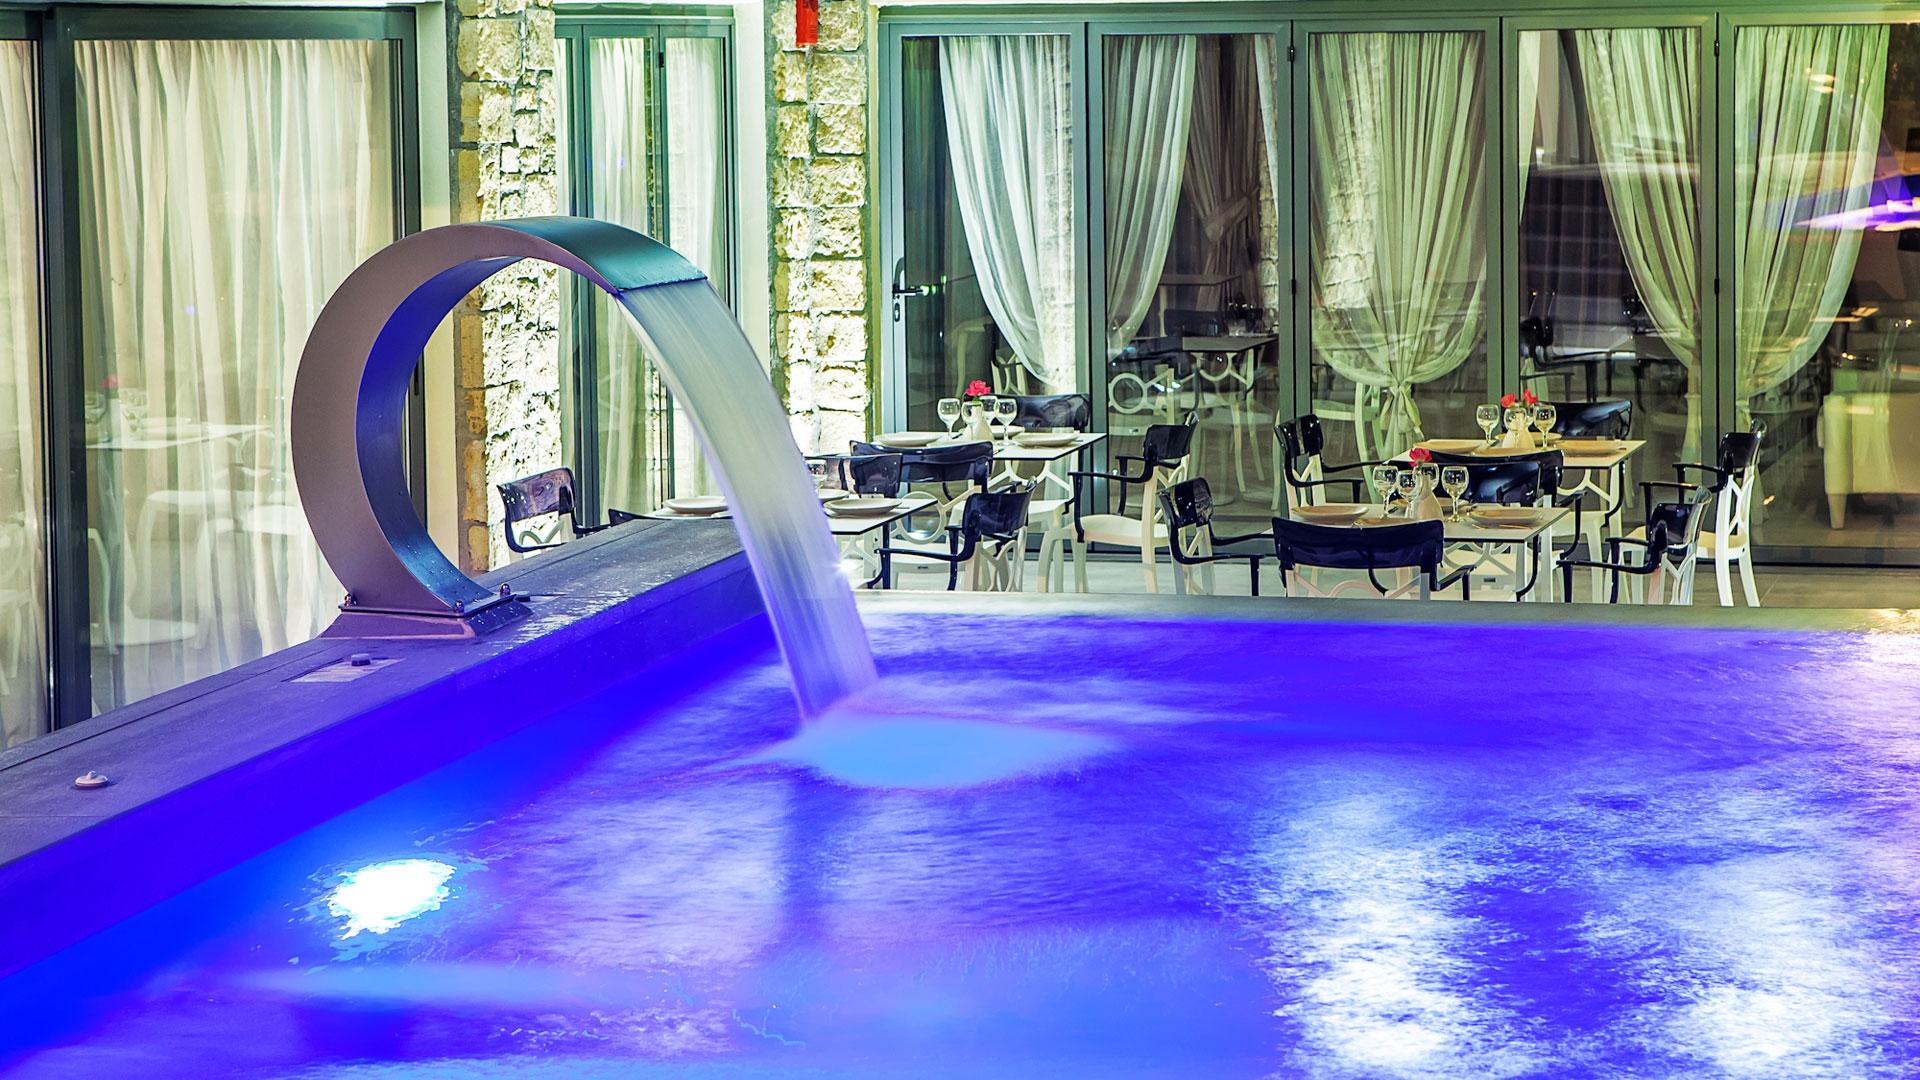 Core Hotels - Πολύχρονο Χαλκιδικής ✦ -33% ✦ 3 Ημέρες